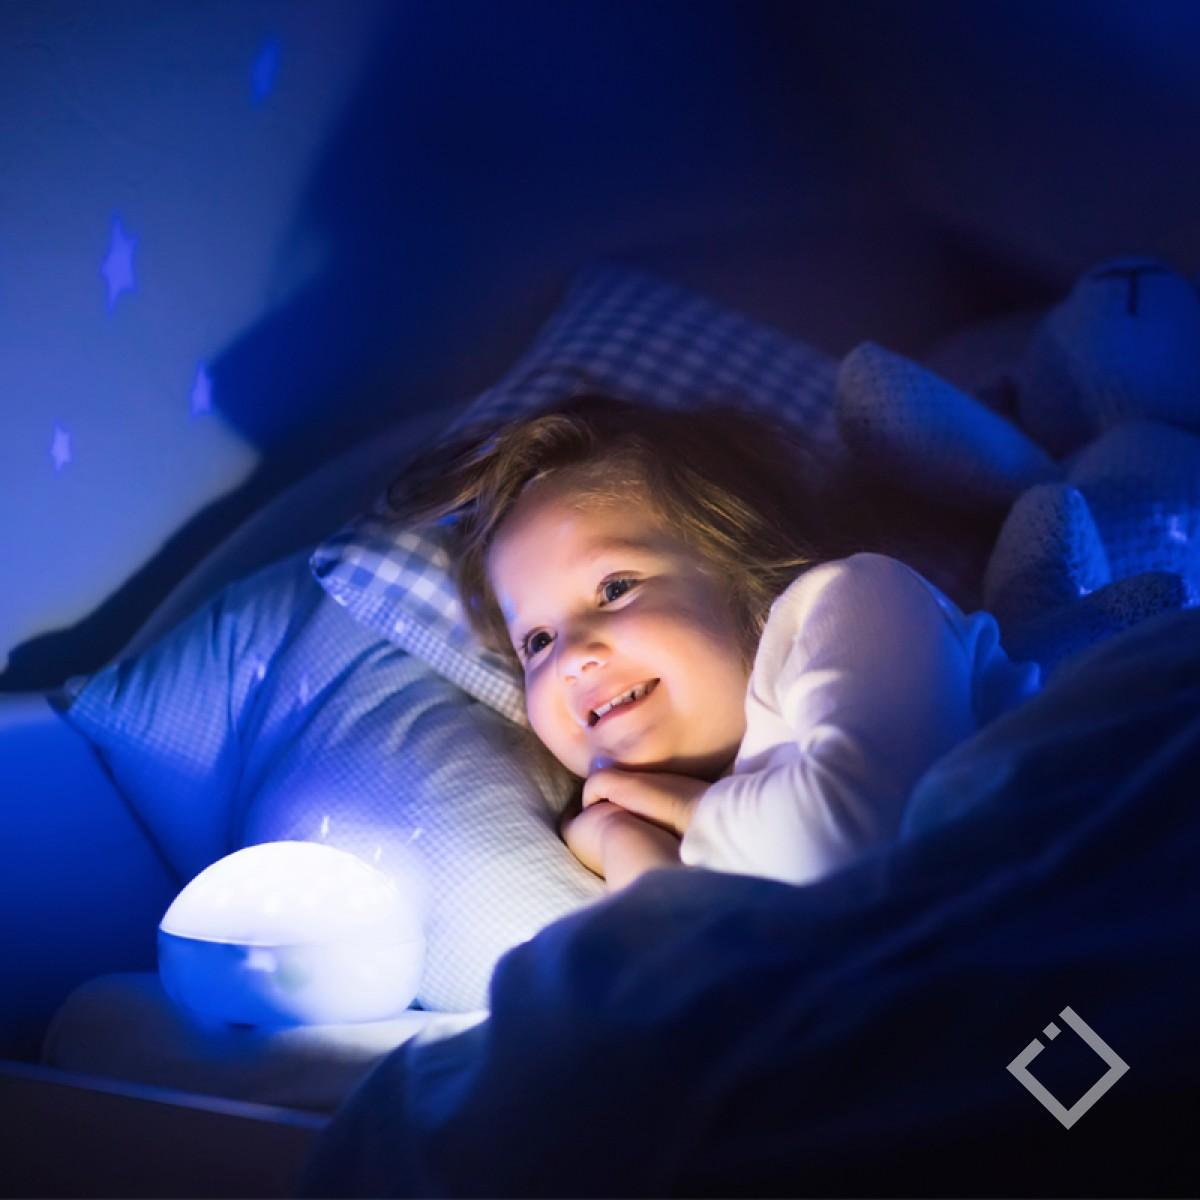 Google-ი ცდილობს დასაქმებულ მშობლებს შვილებთან ურთიერთობაში დაეხმაროს